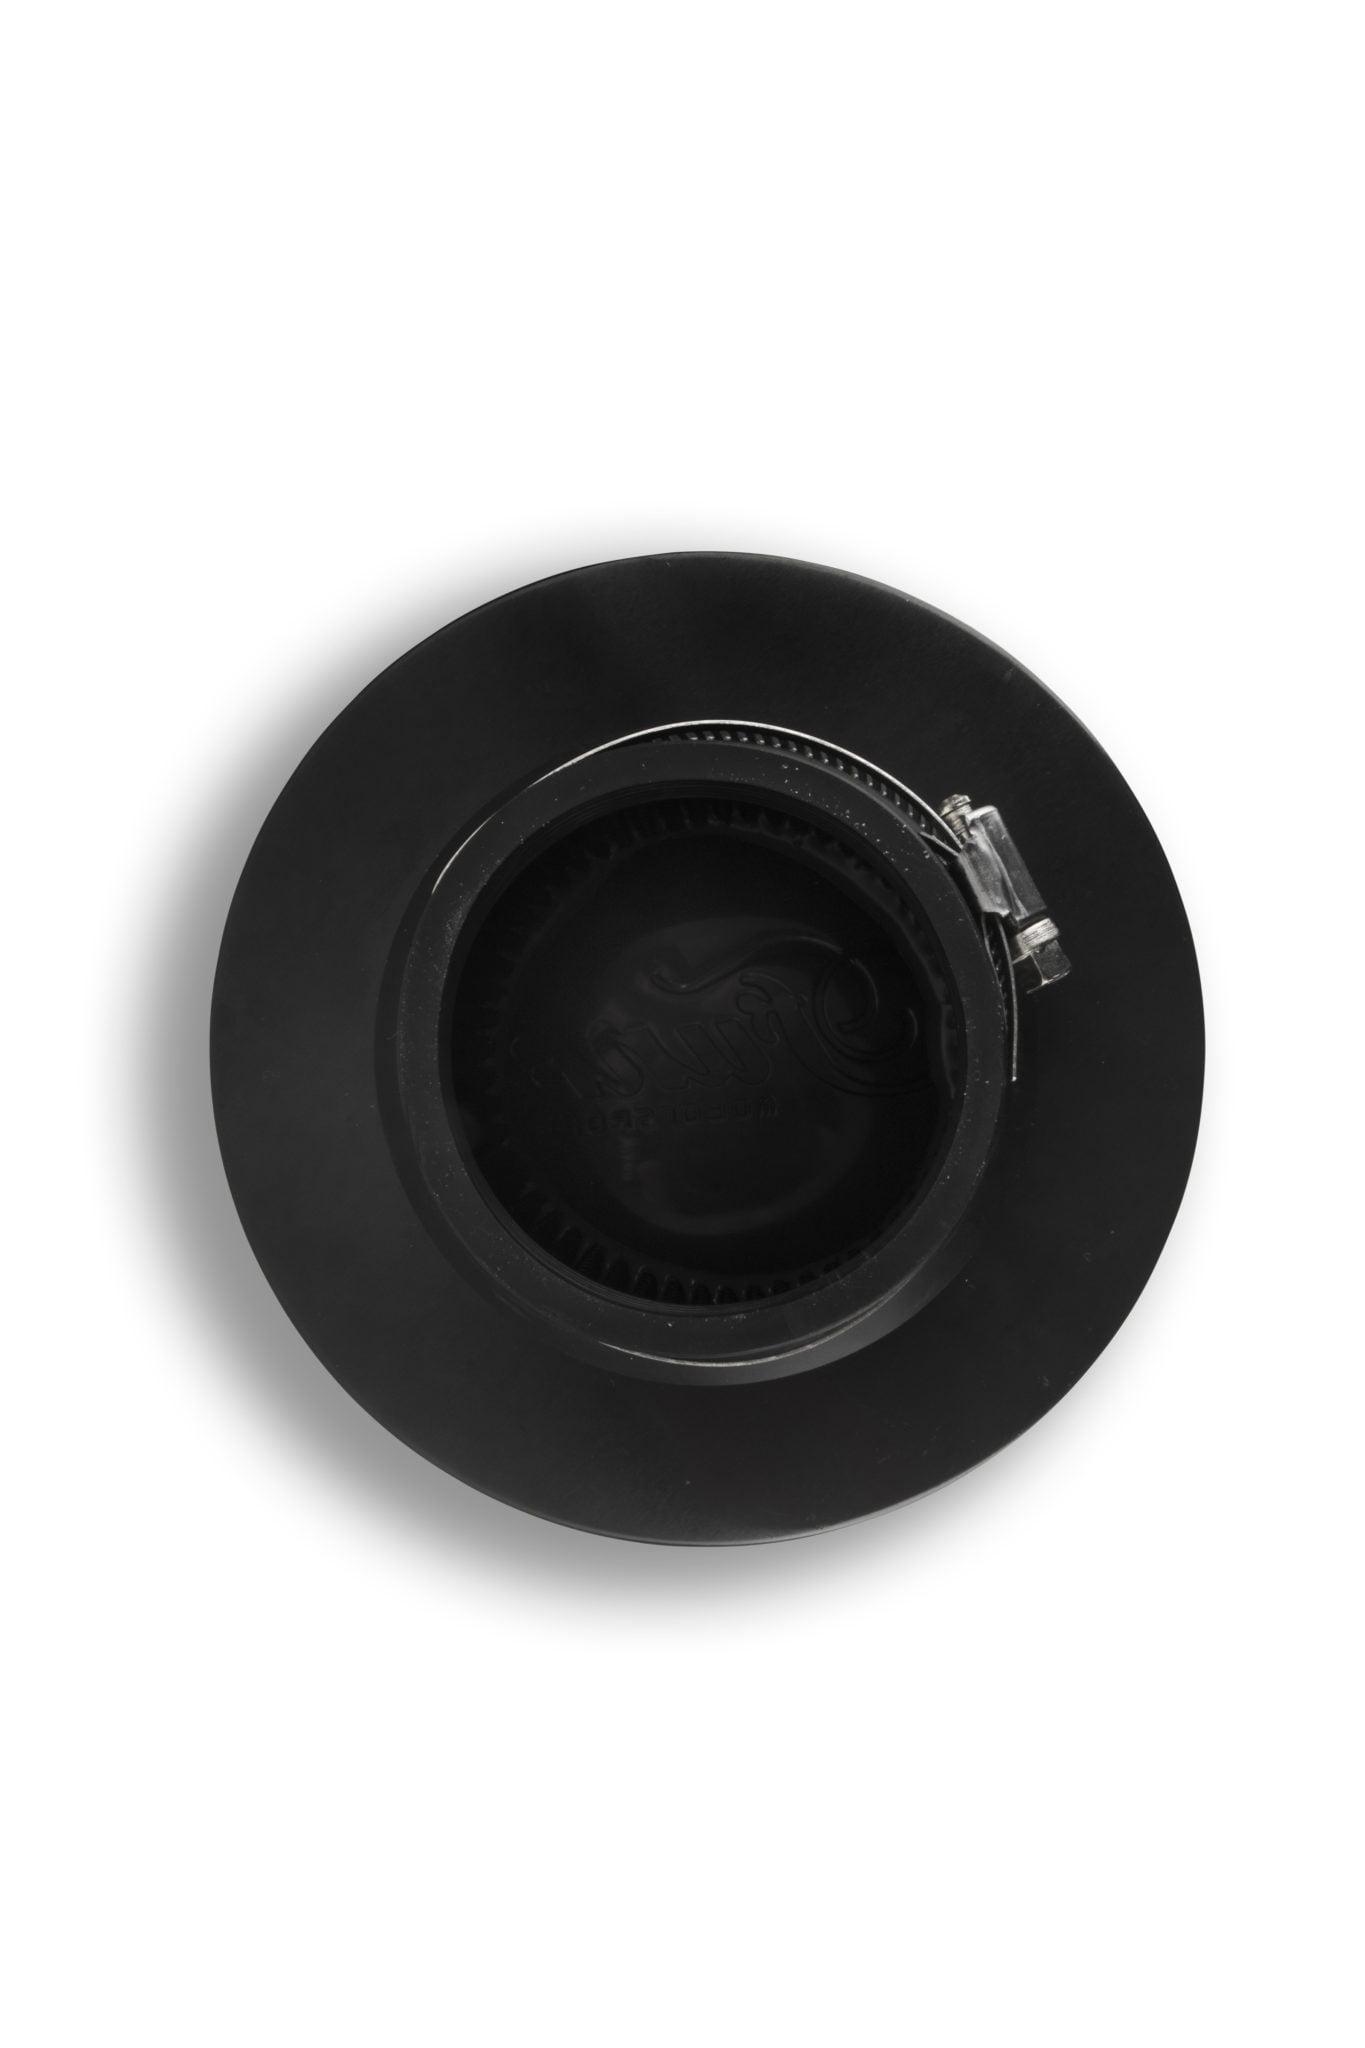 Funk Motorsport Black Cone Air Filter